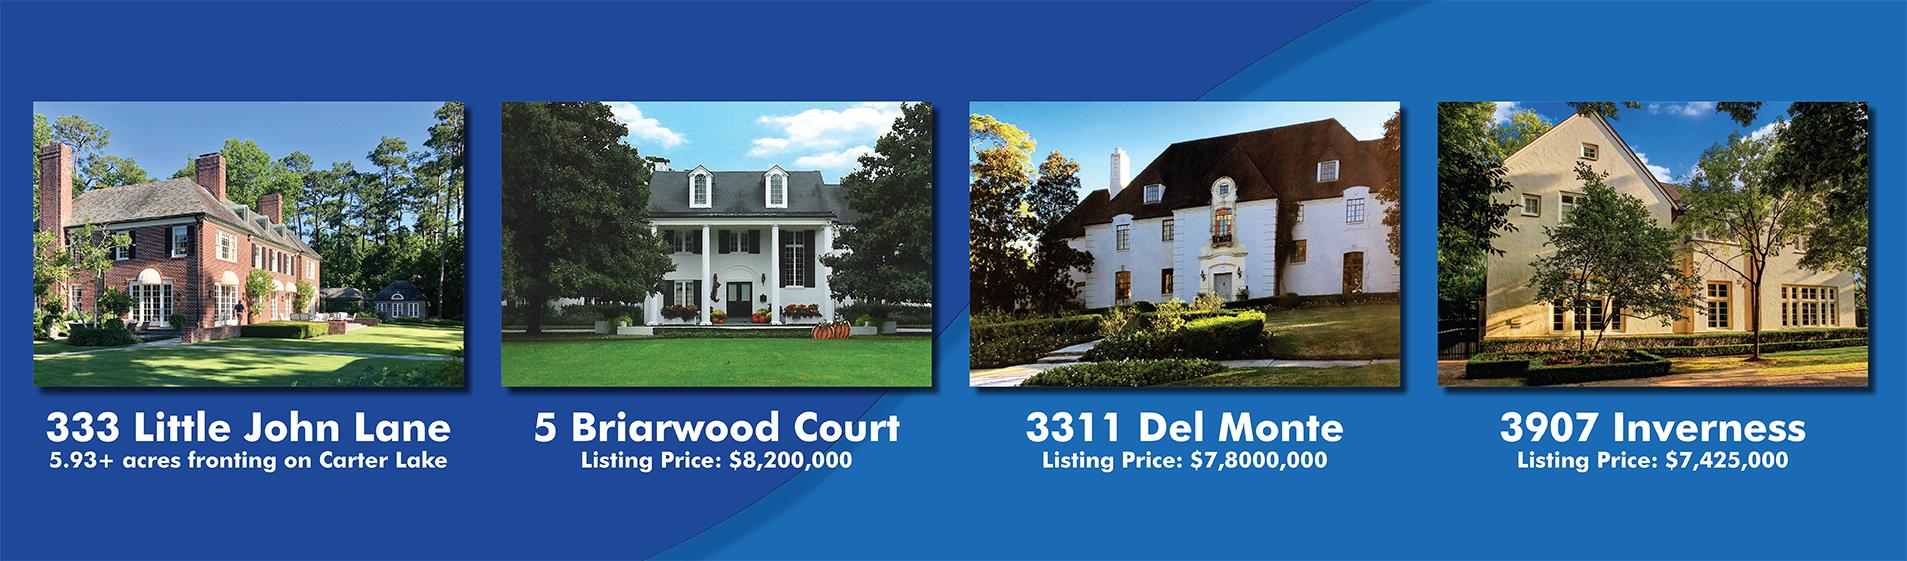 Recently Sold Properties